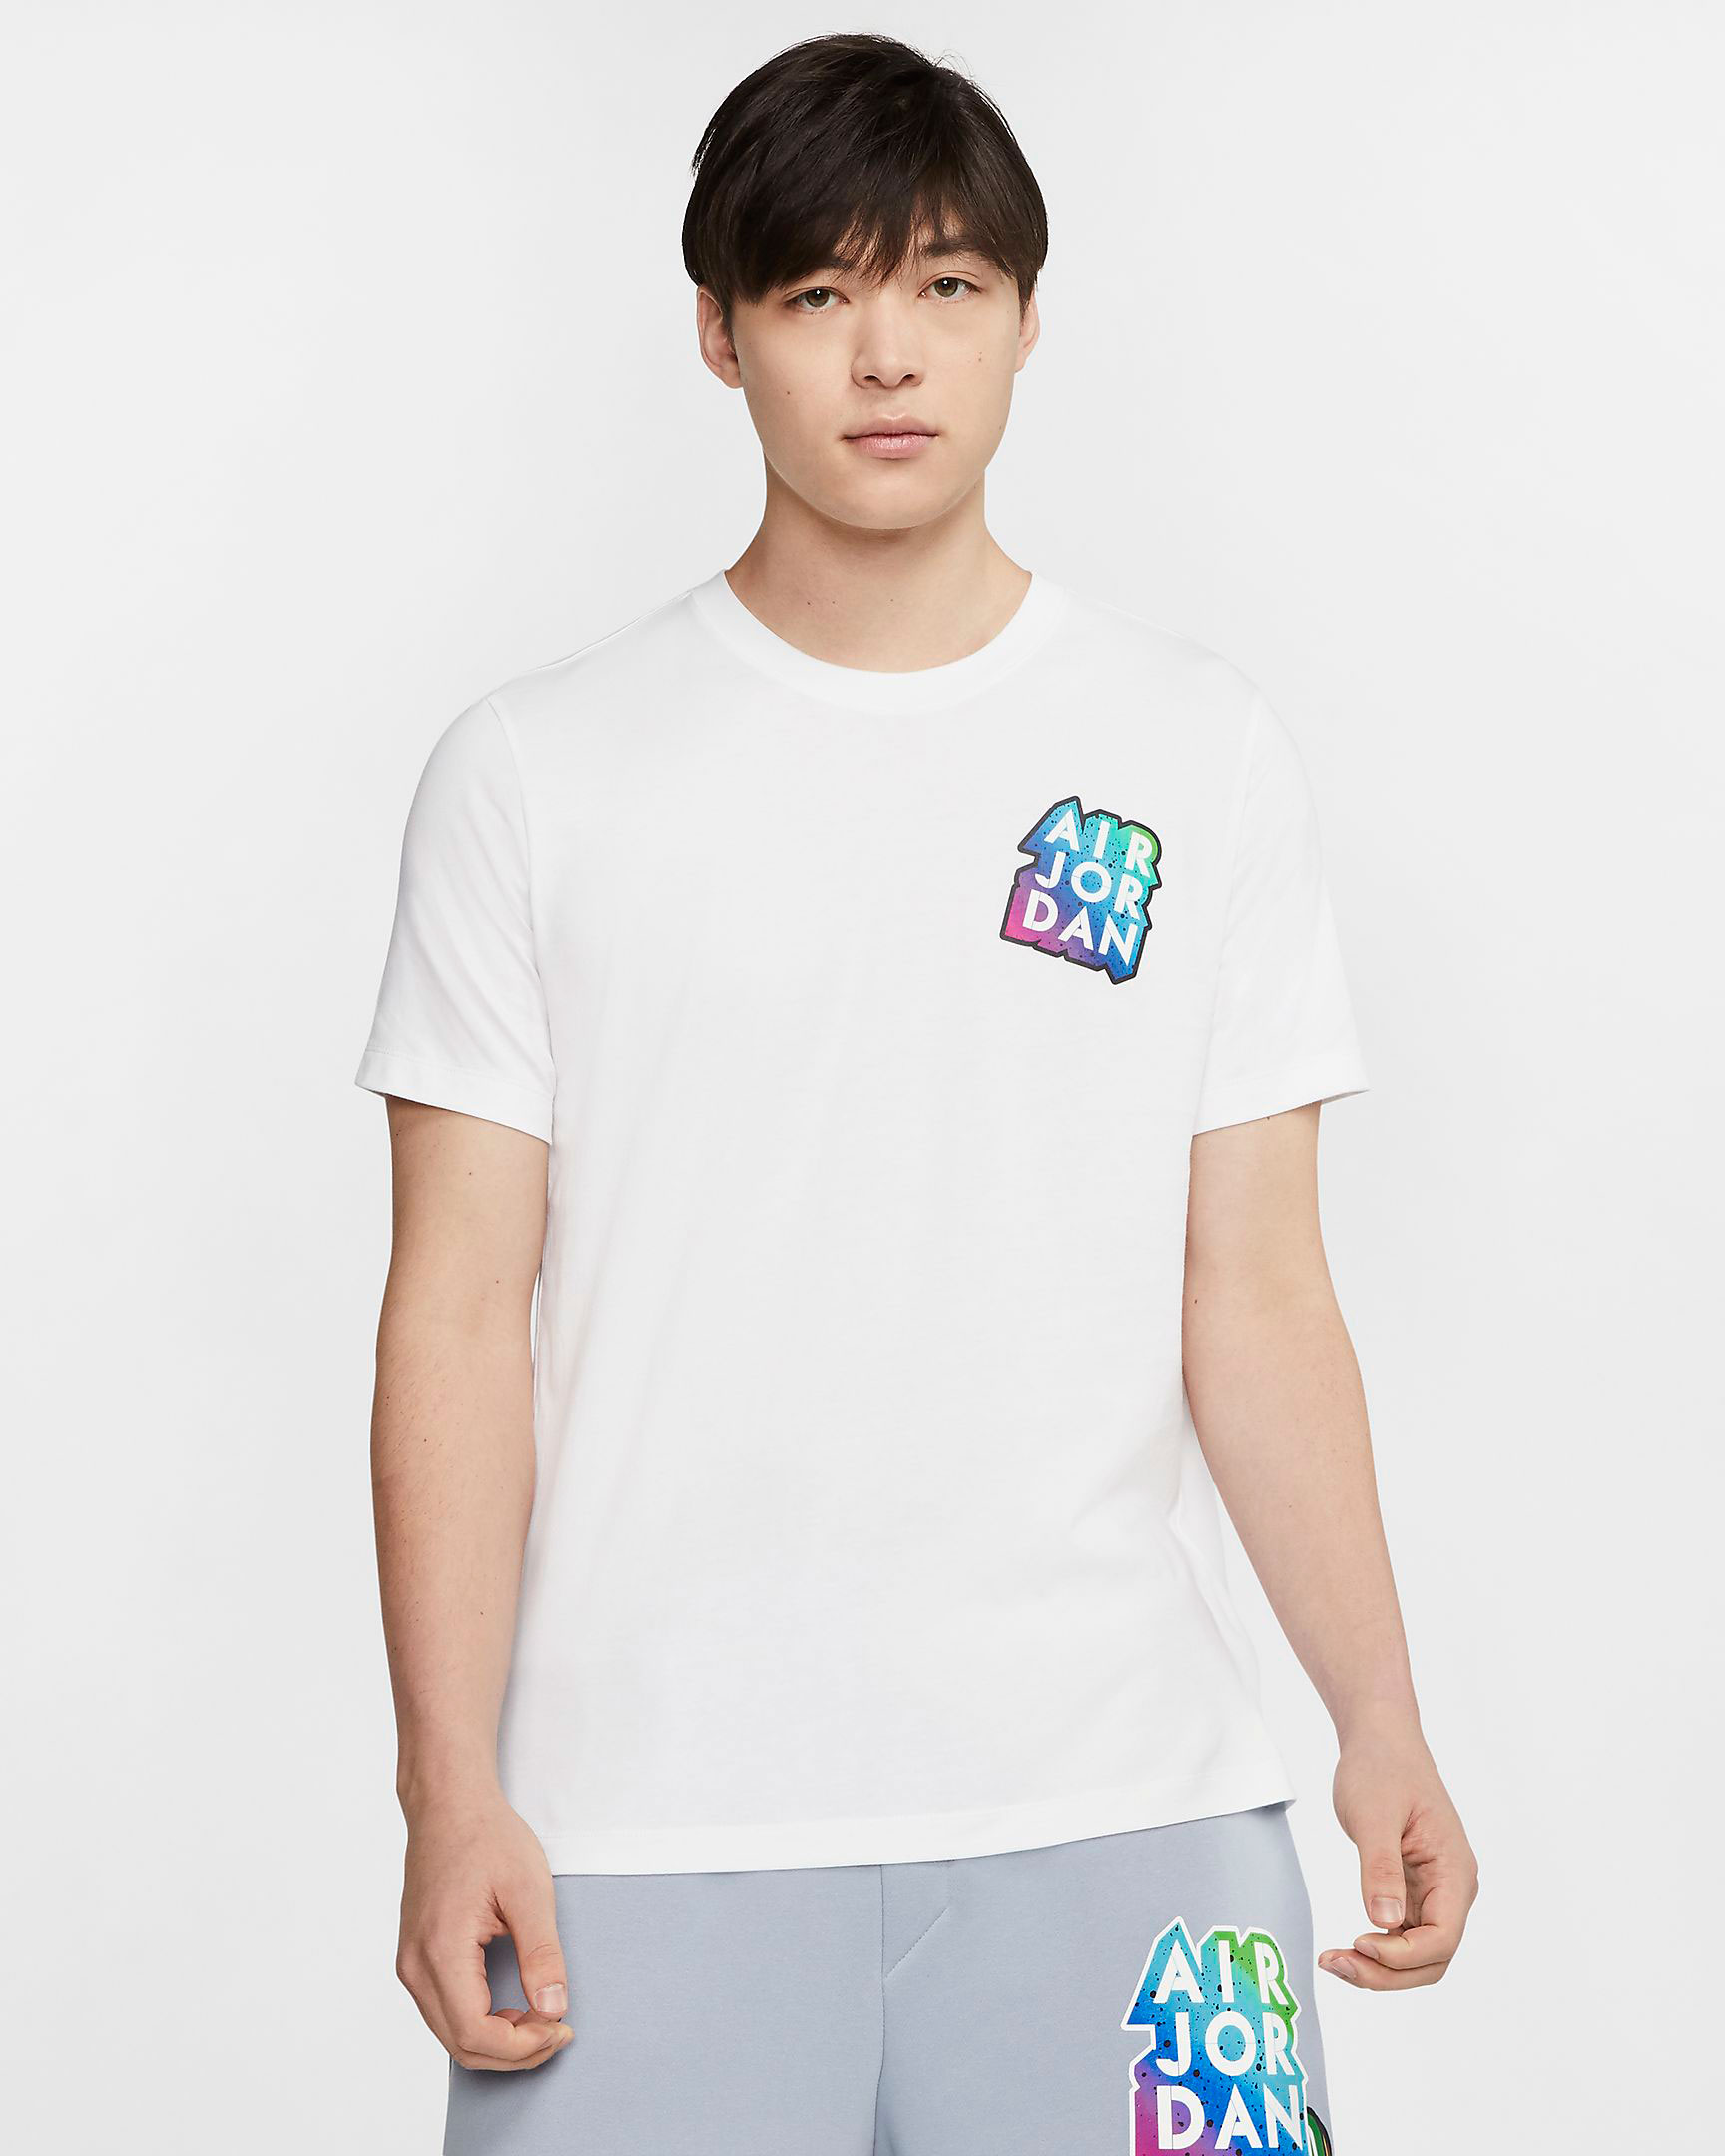 jordan-5-alternate-bel-air-matching-t-shirt-1